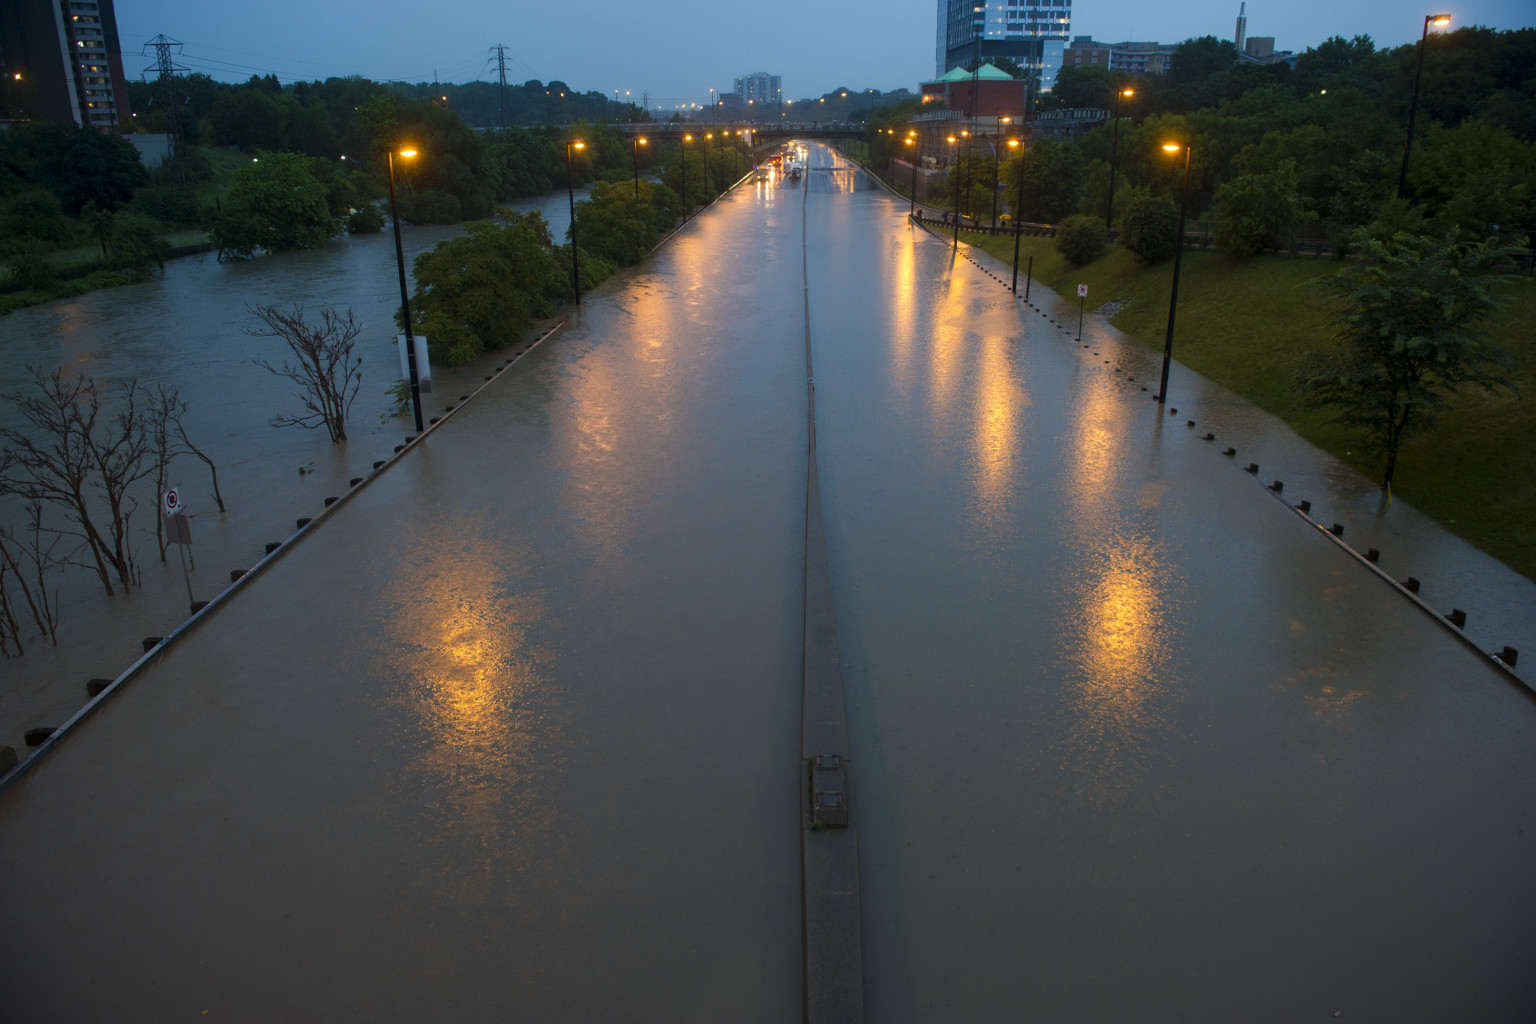 Toronto Floods 2013 More Rain Expected As Region Dries